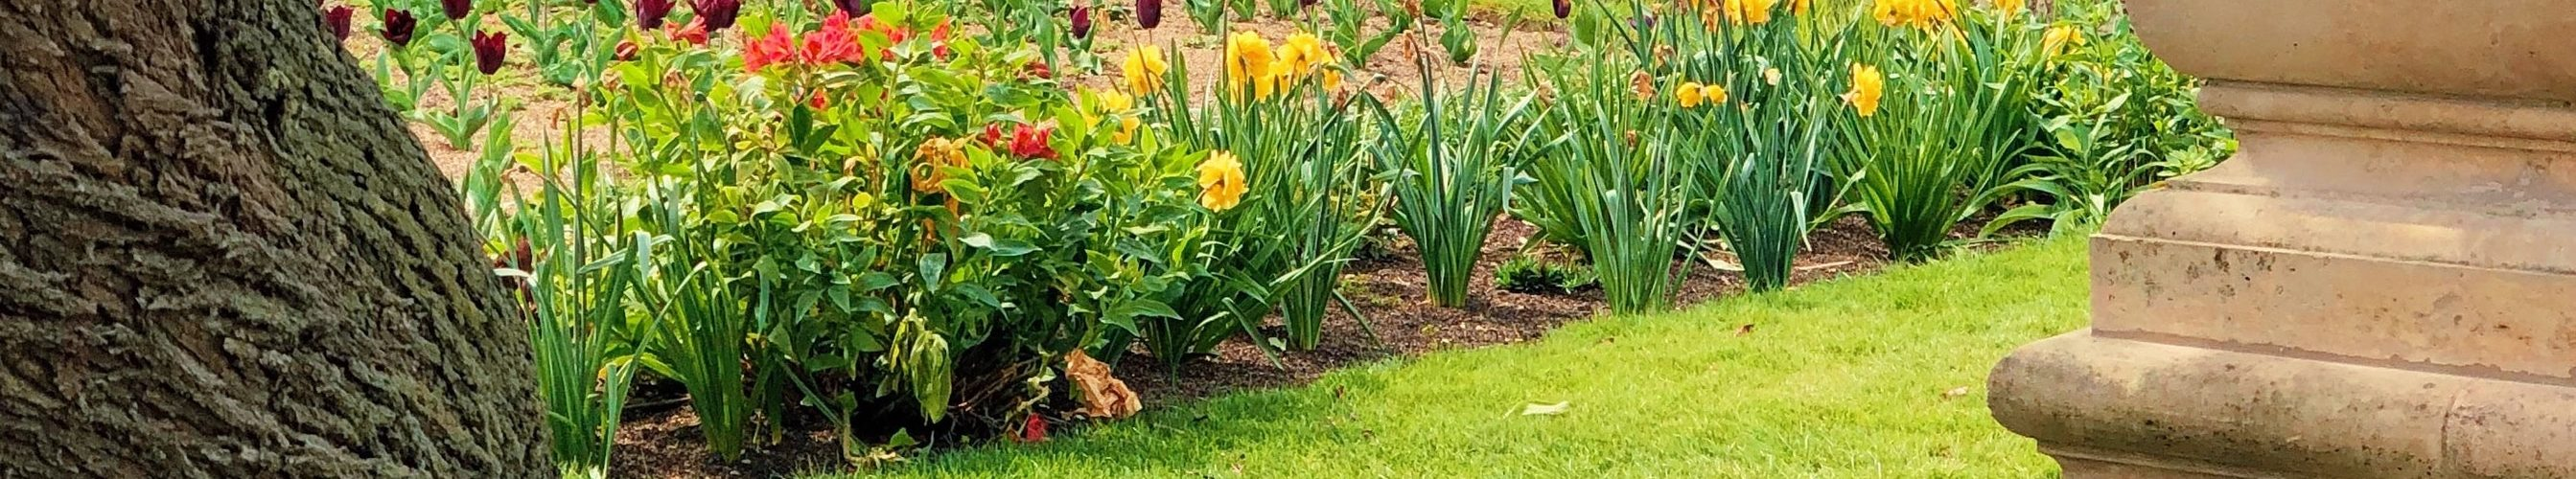 tuin-bloemen